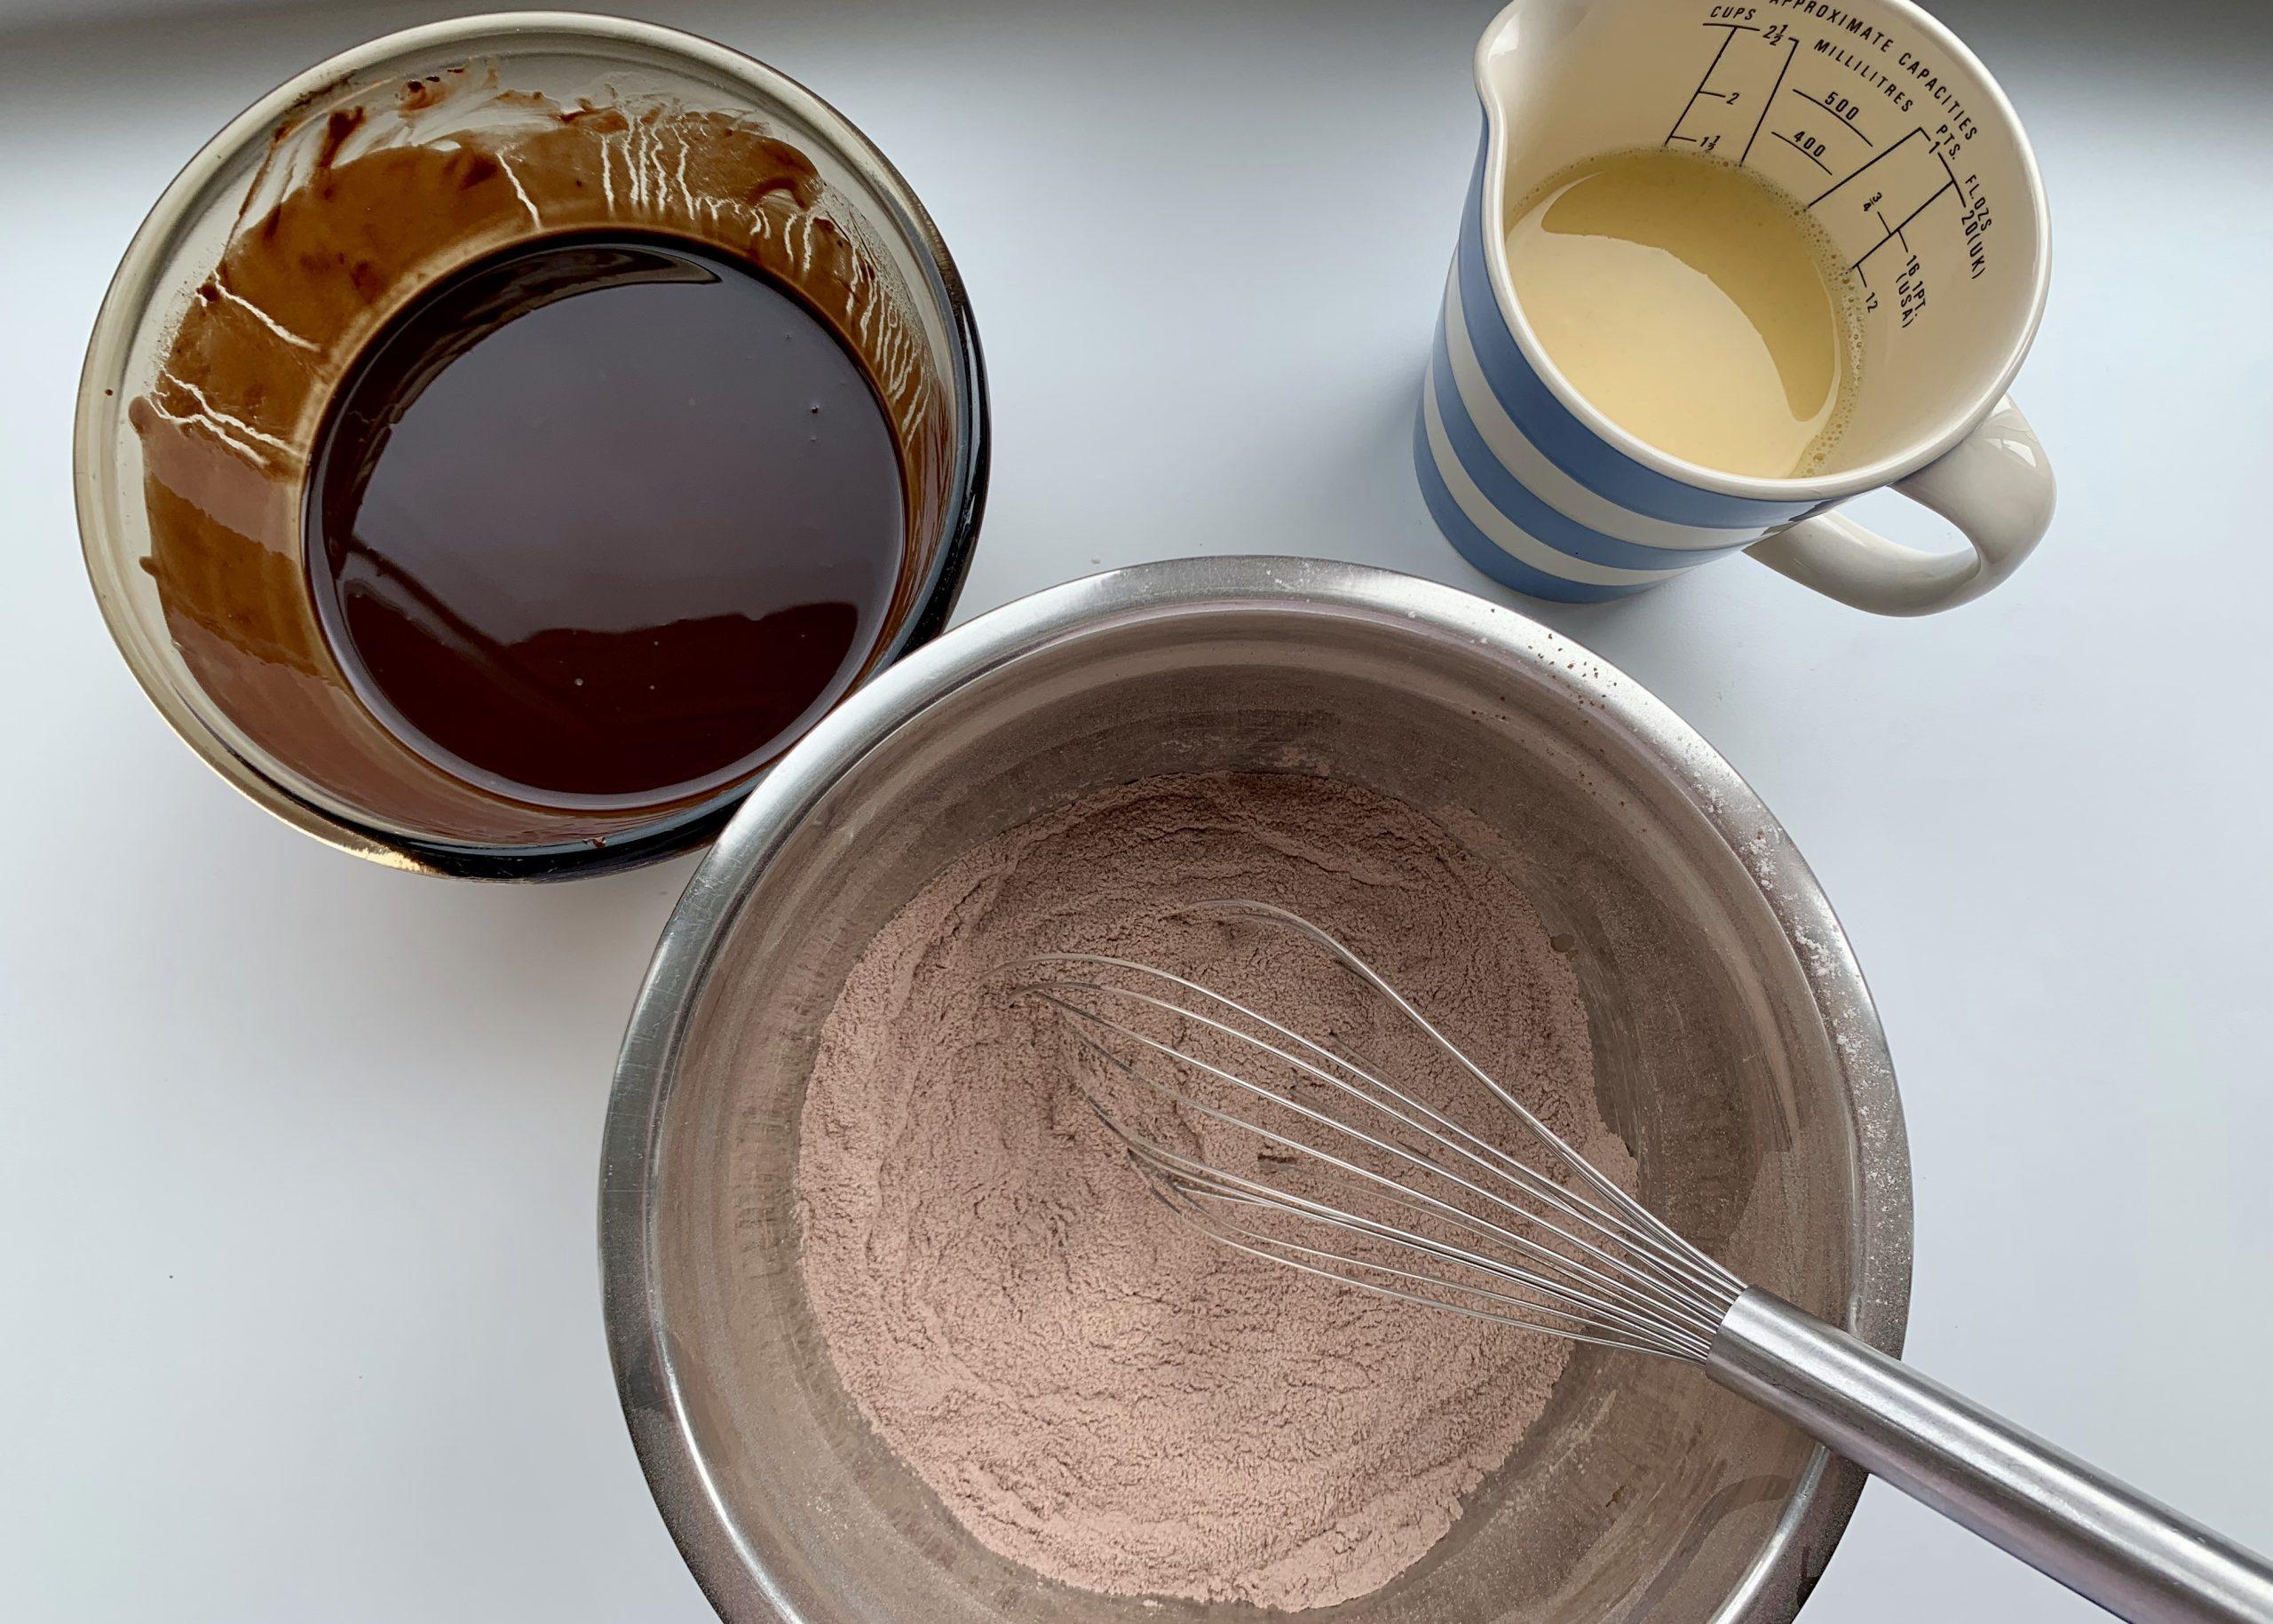 Ingredients needed to make gluten free chocolate muffins